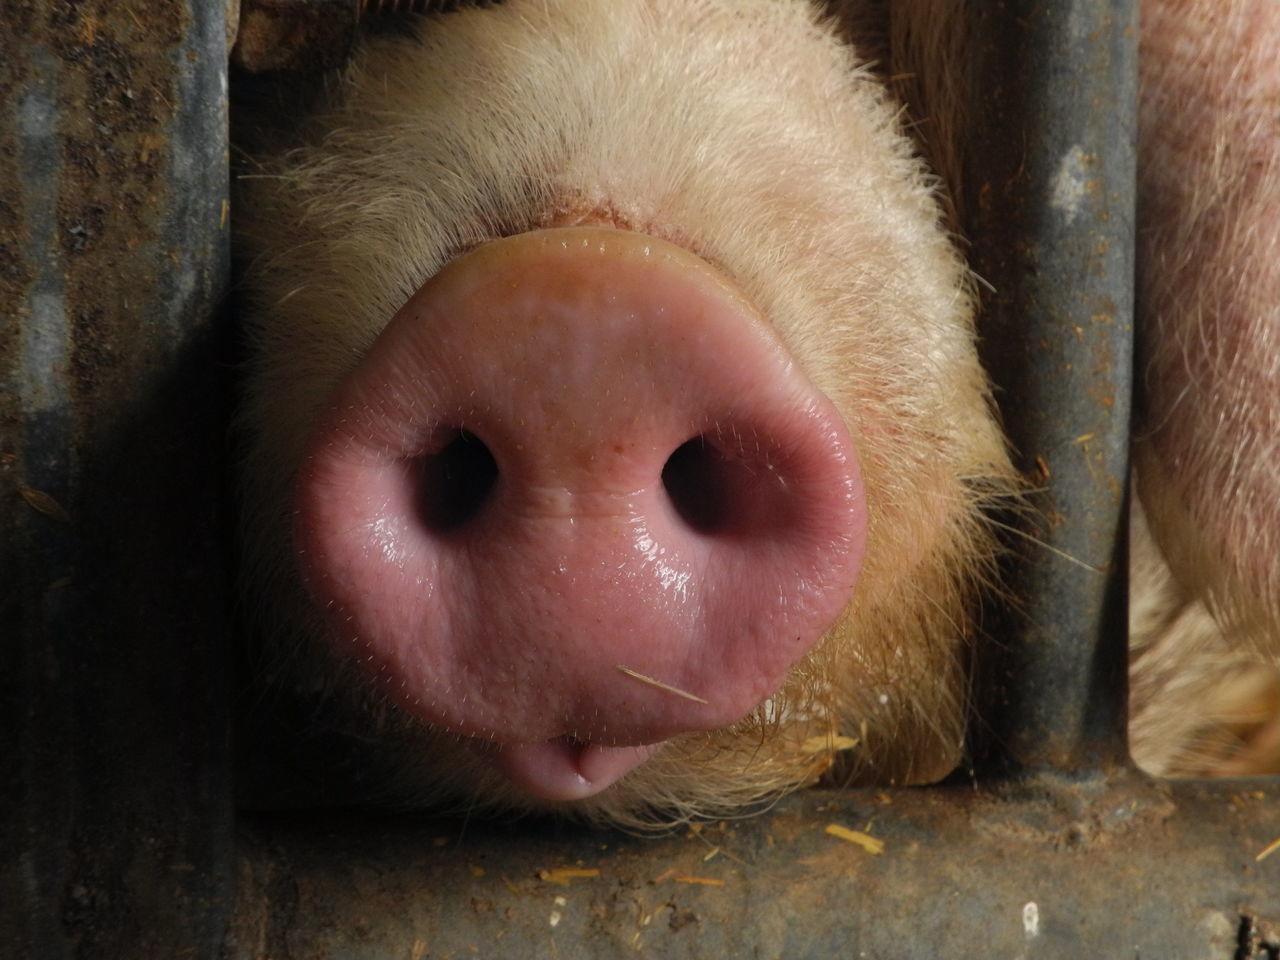 Arche de la nature Animal Body Part Animal Themes Close-up Domestic Animals Mammal Pig Pink Snout